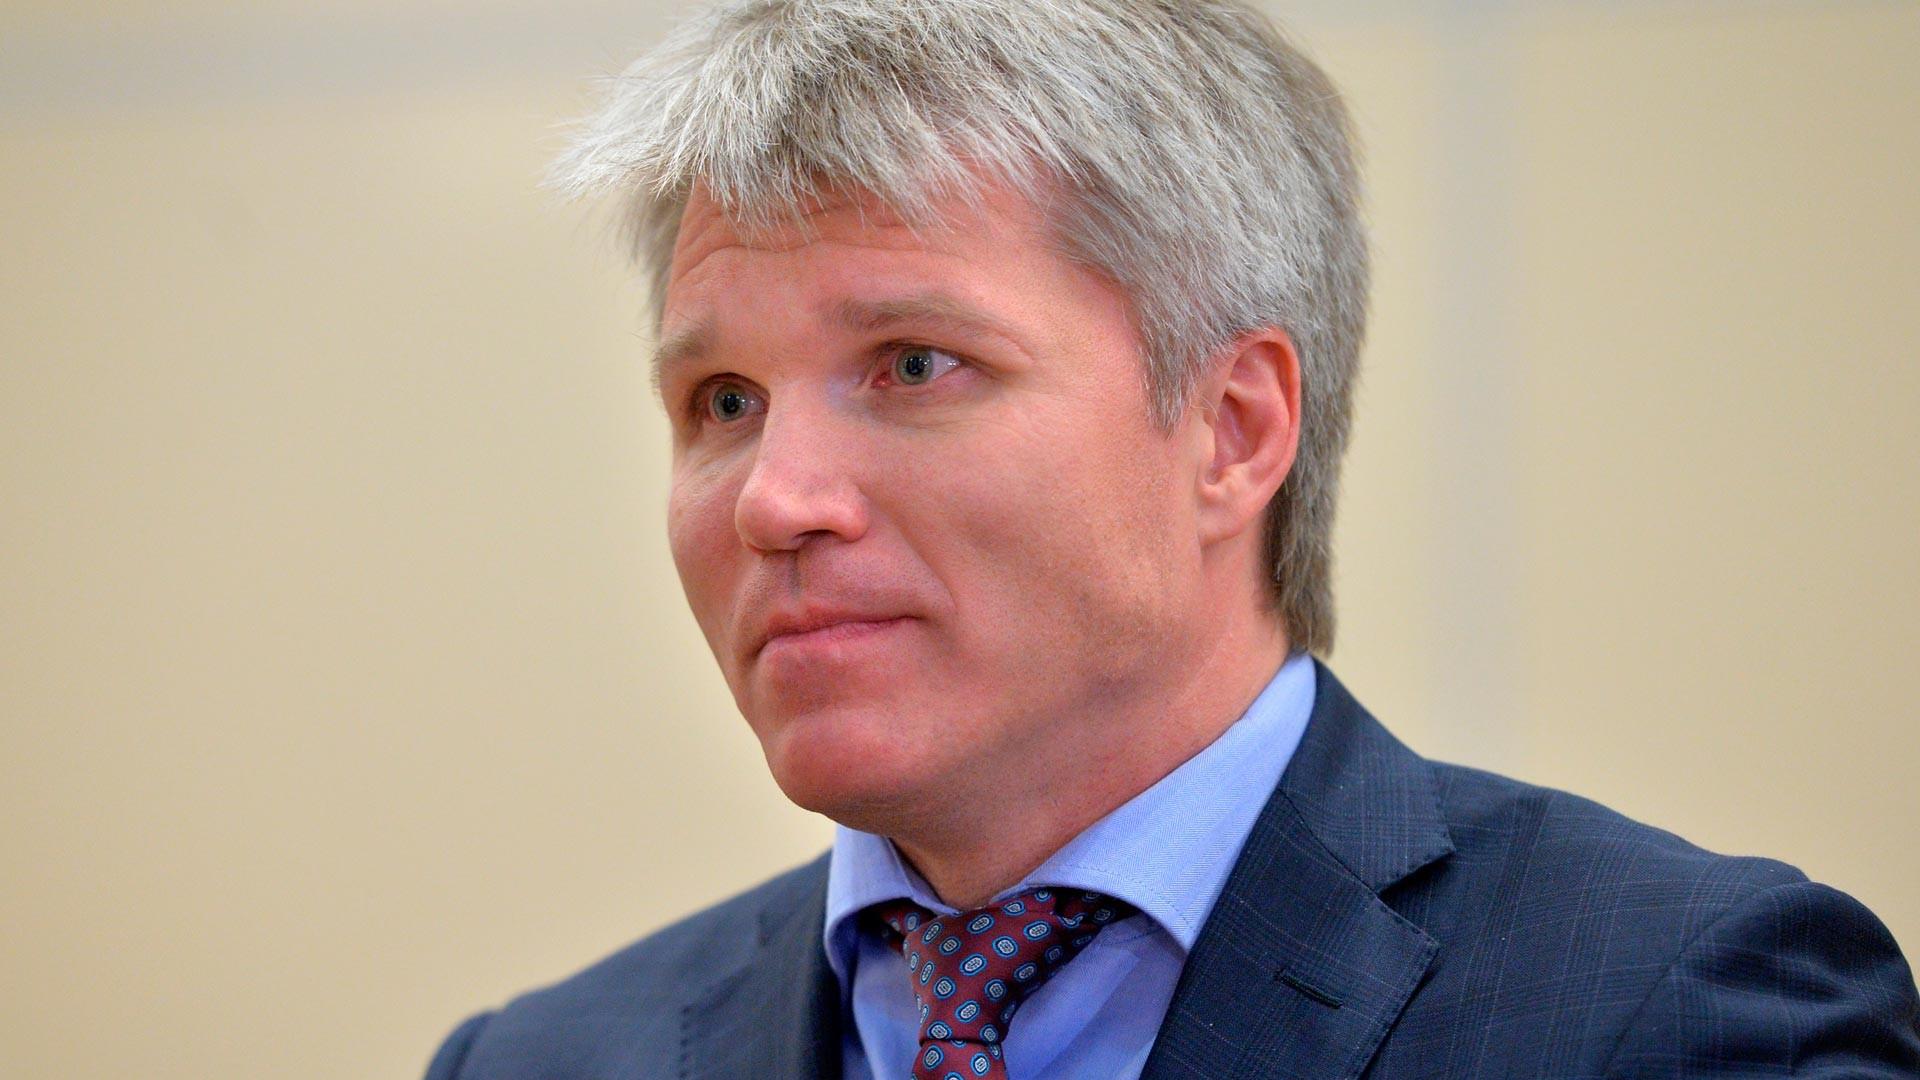 <p>Фото: &copy;РИА Новости/Алексей Дружинин</p>